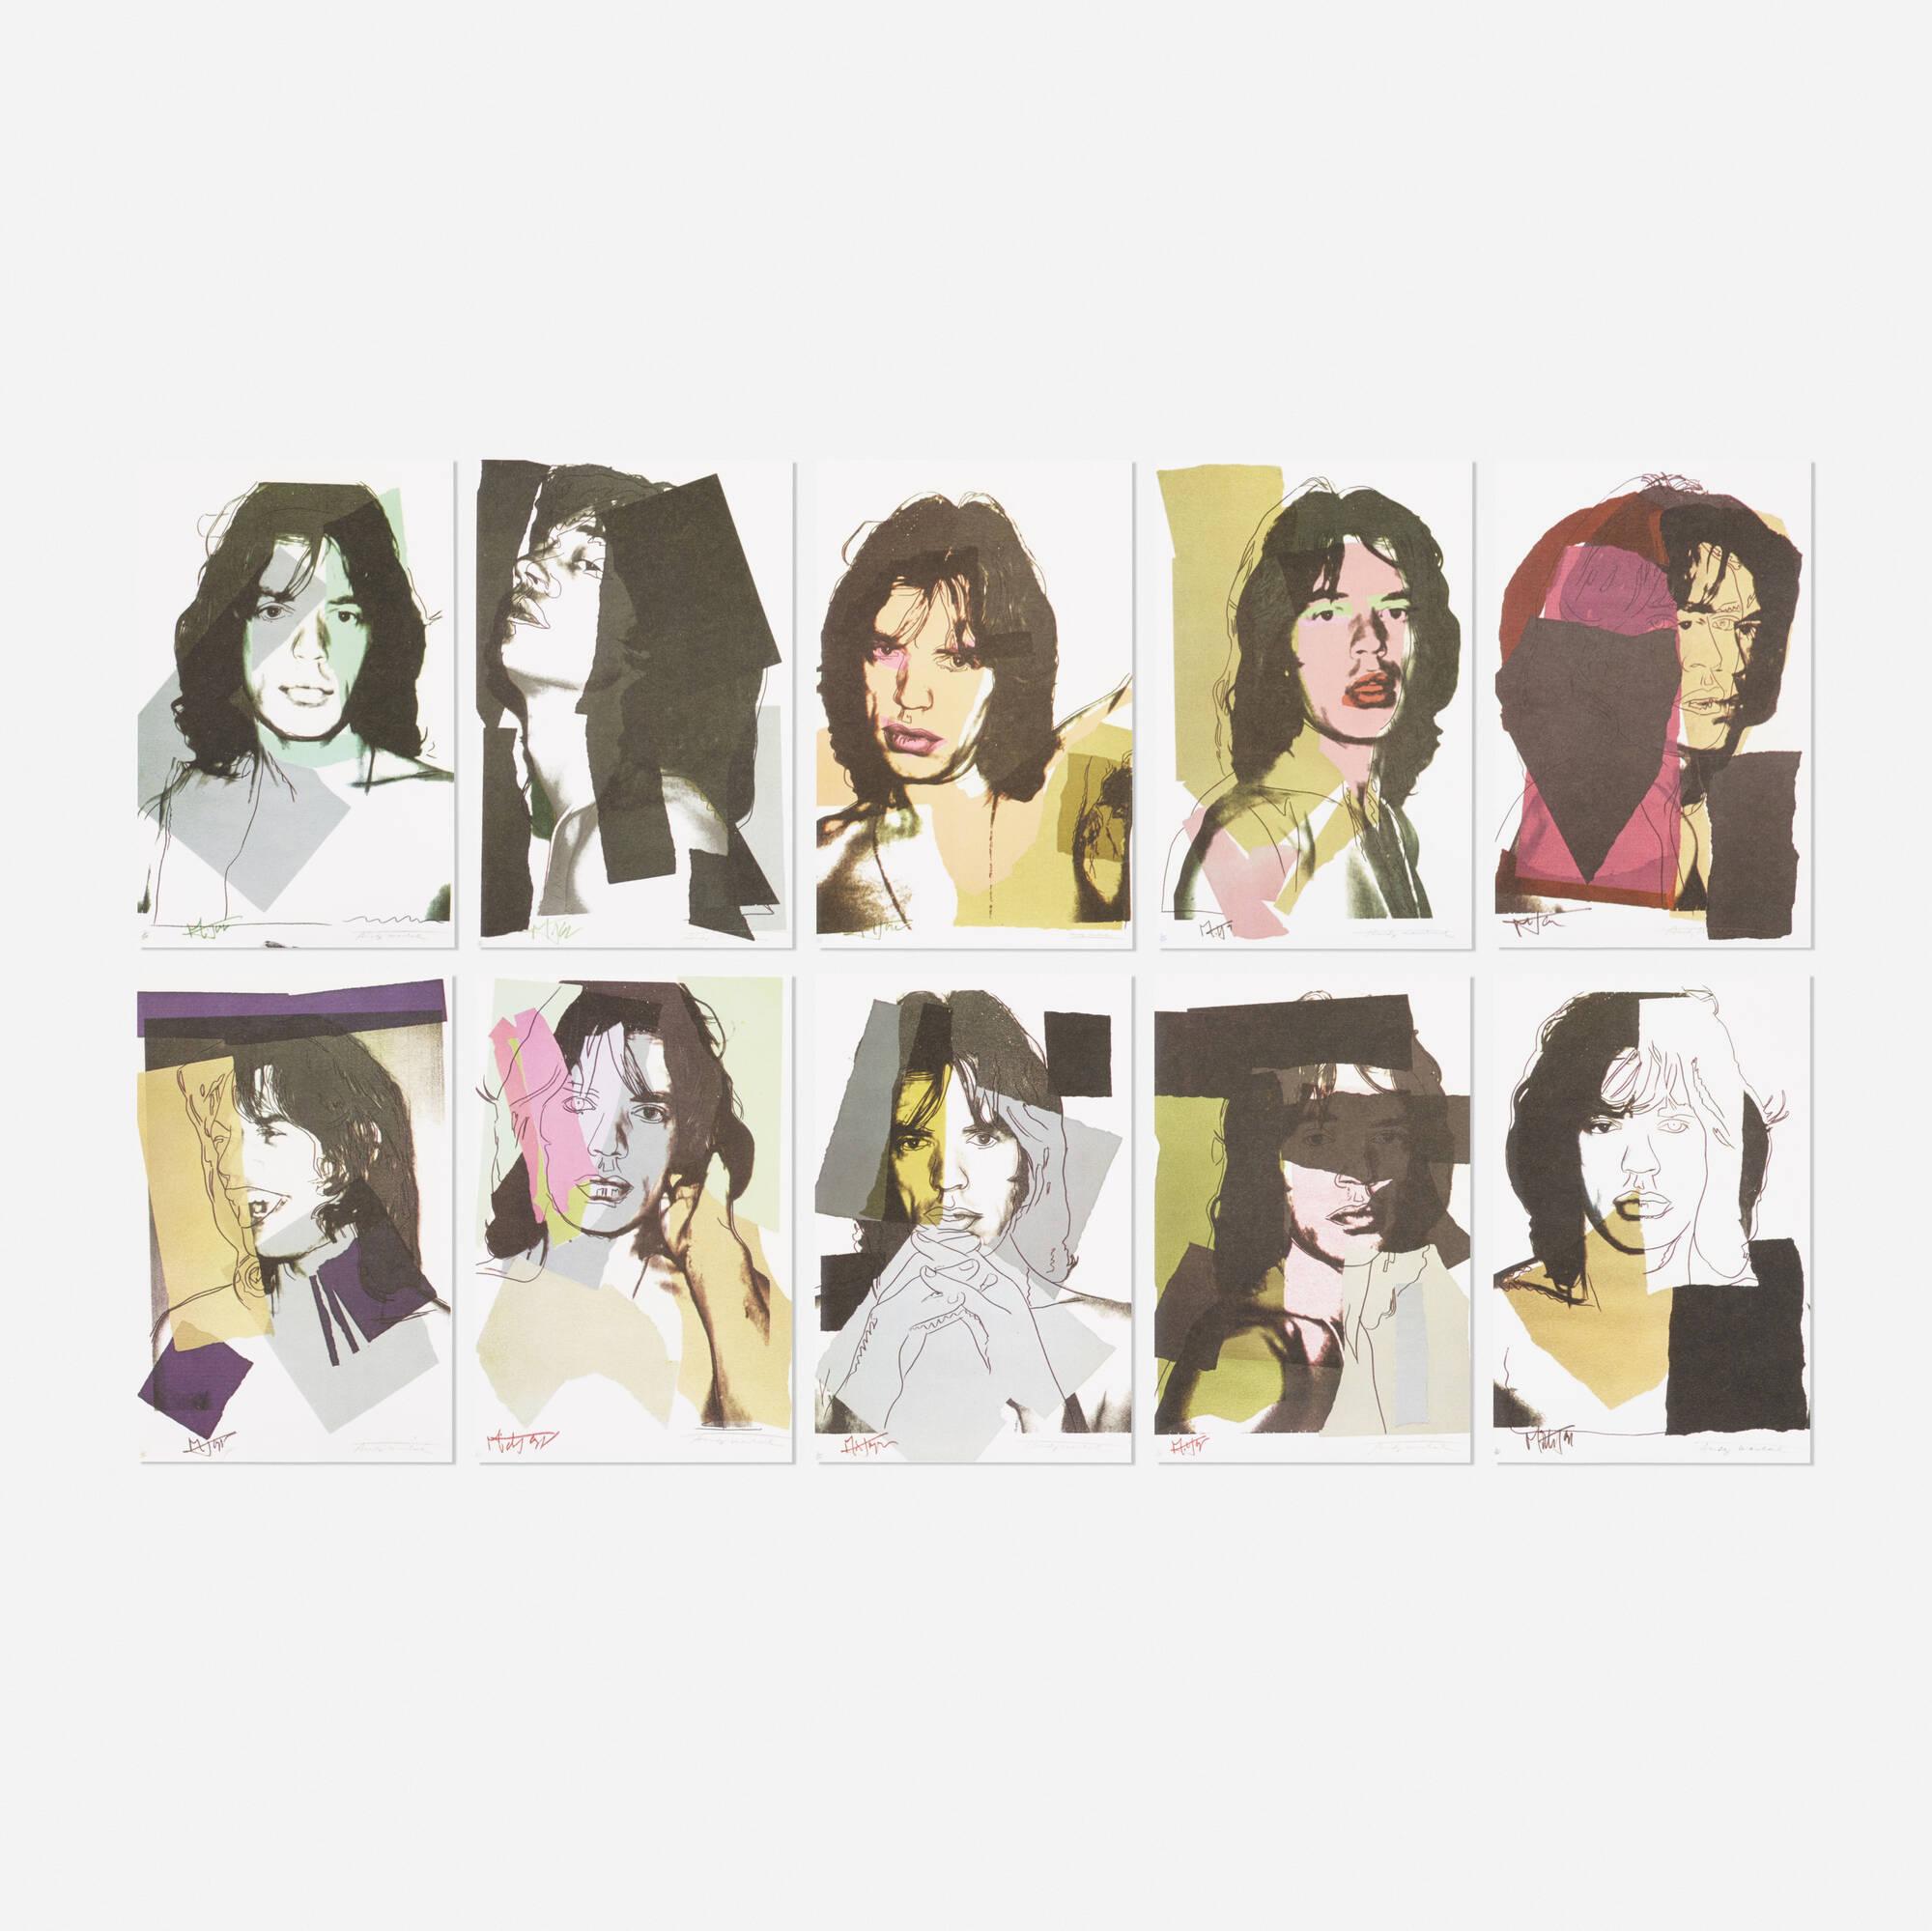 225: After Andy Warhol / Mick Jagger Sample portfolio (ten works) (1 of 1)